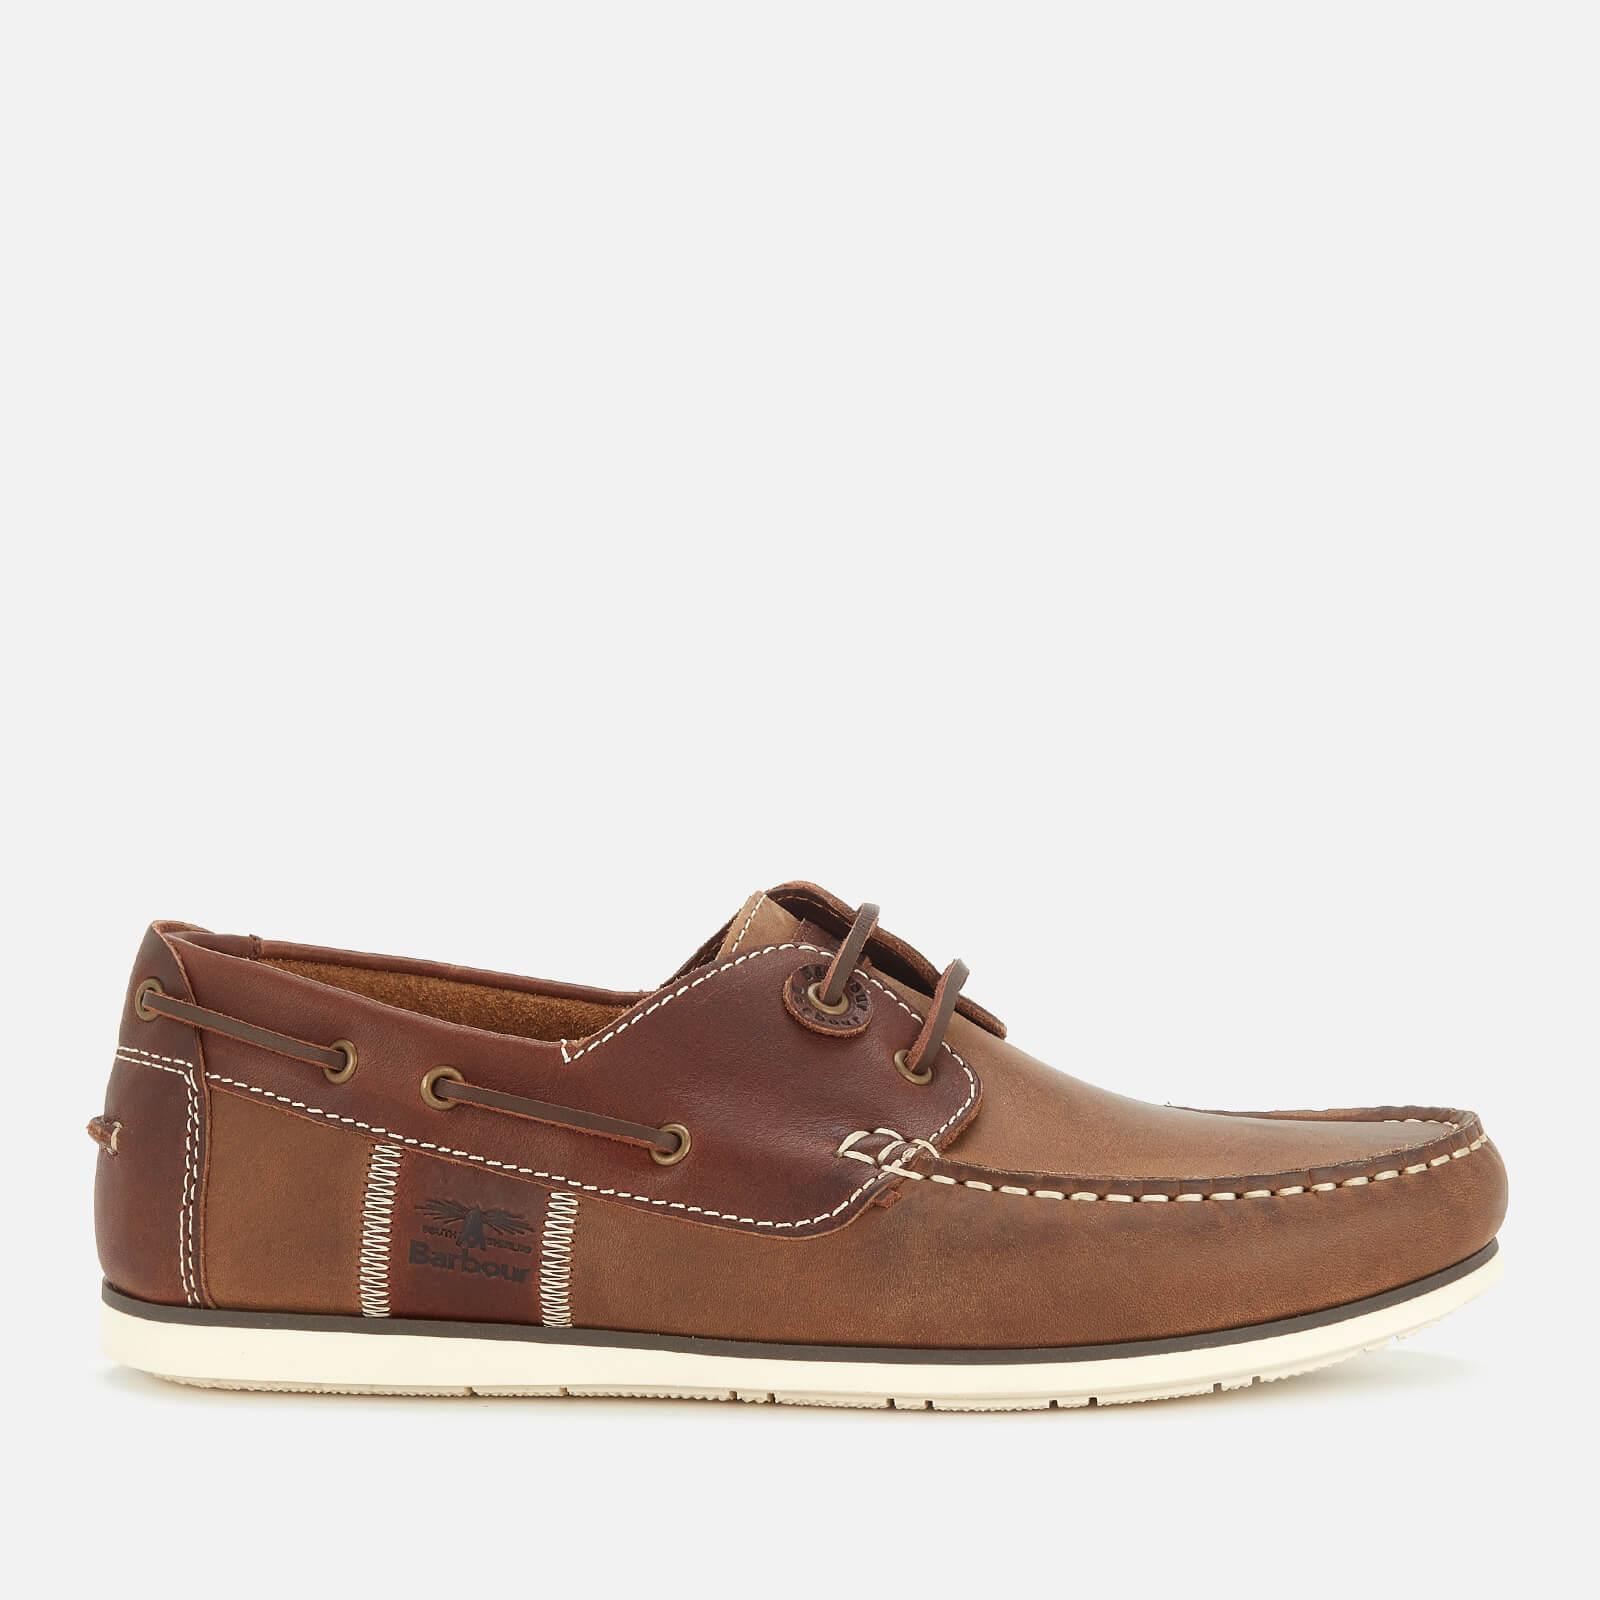 Barbour Men's Capstan Leather Boat Shoes - Beige/Brown - UK 8